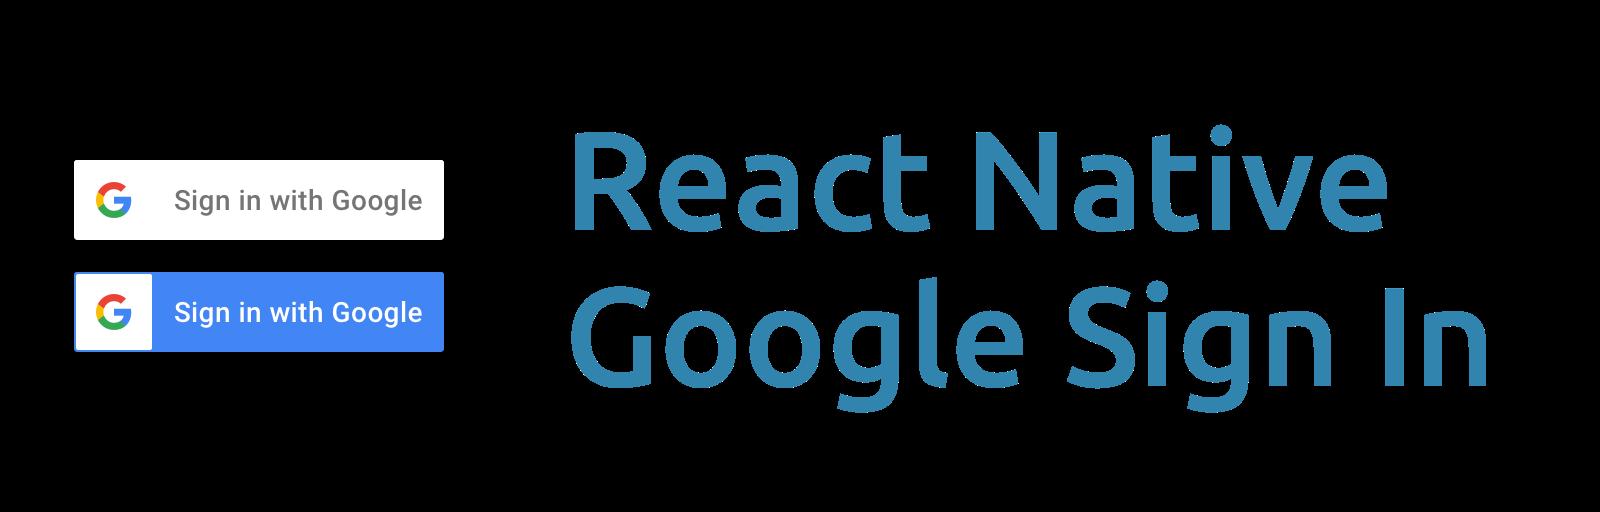 react-native-google-signin - npm